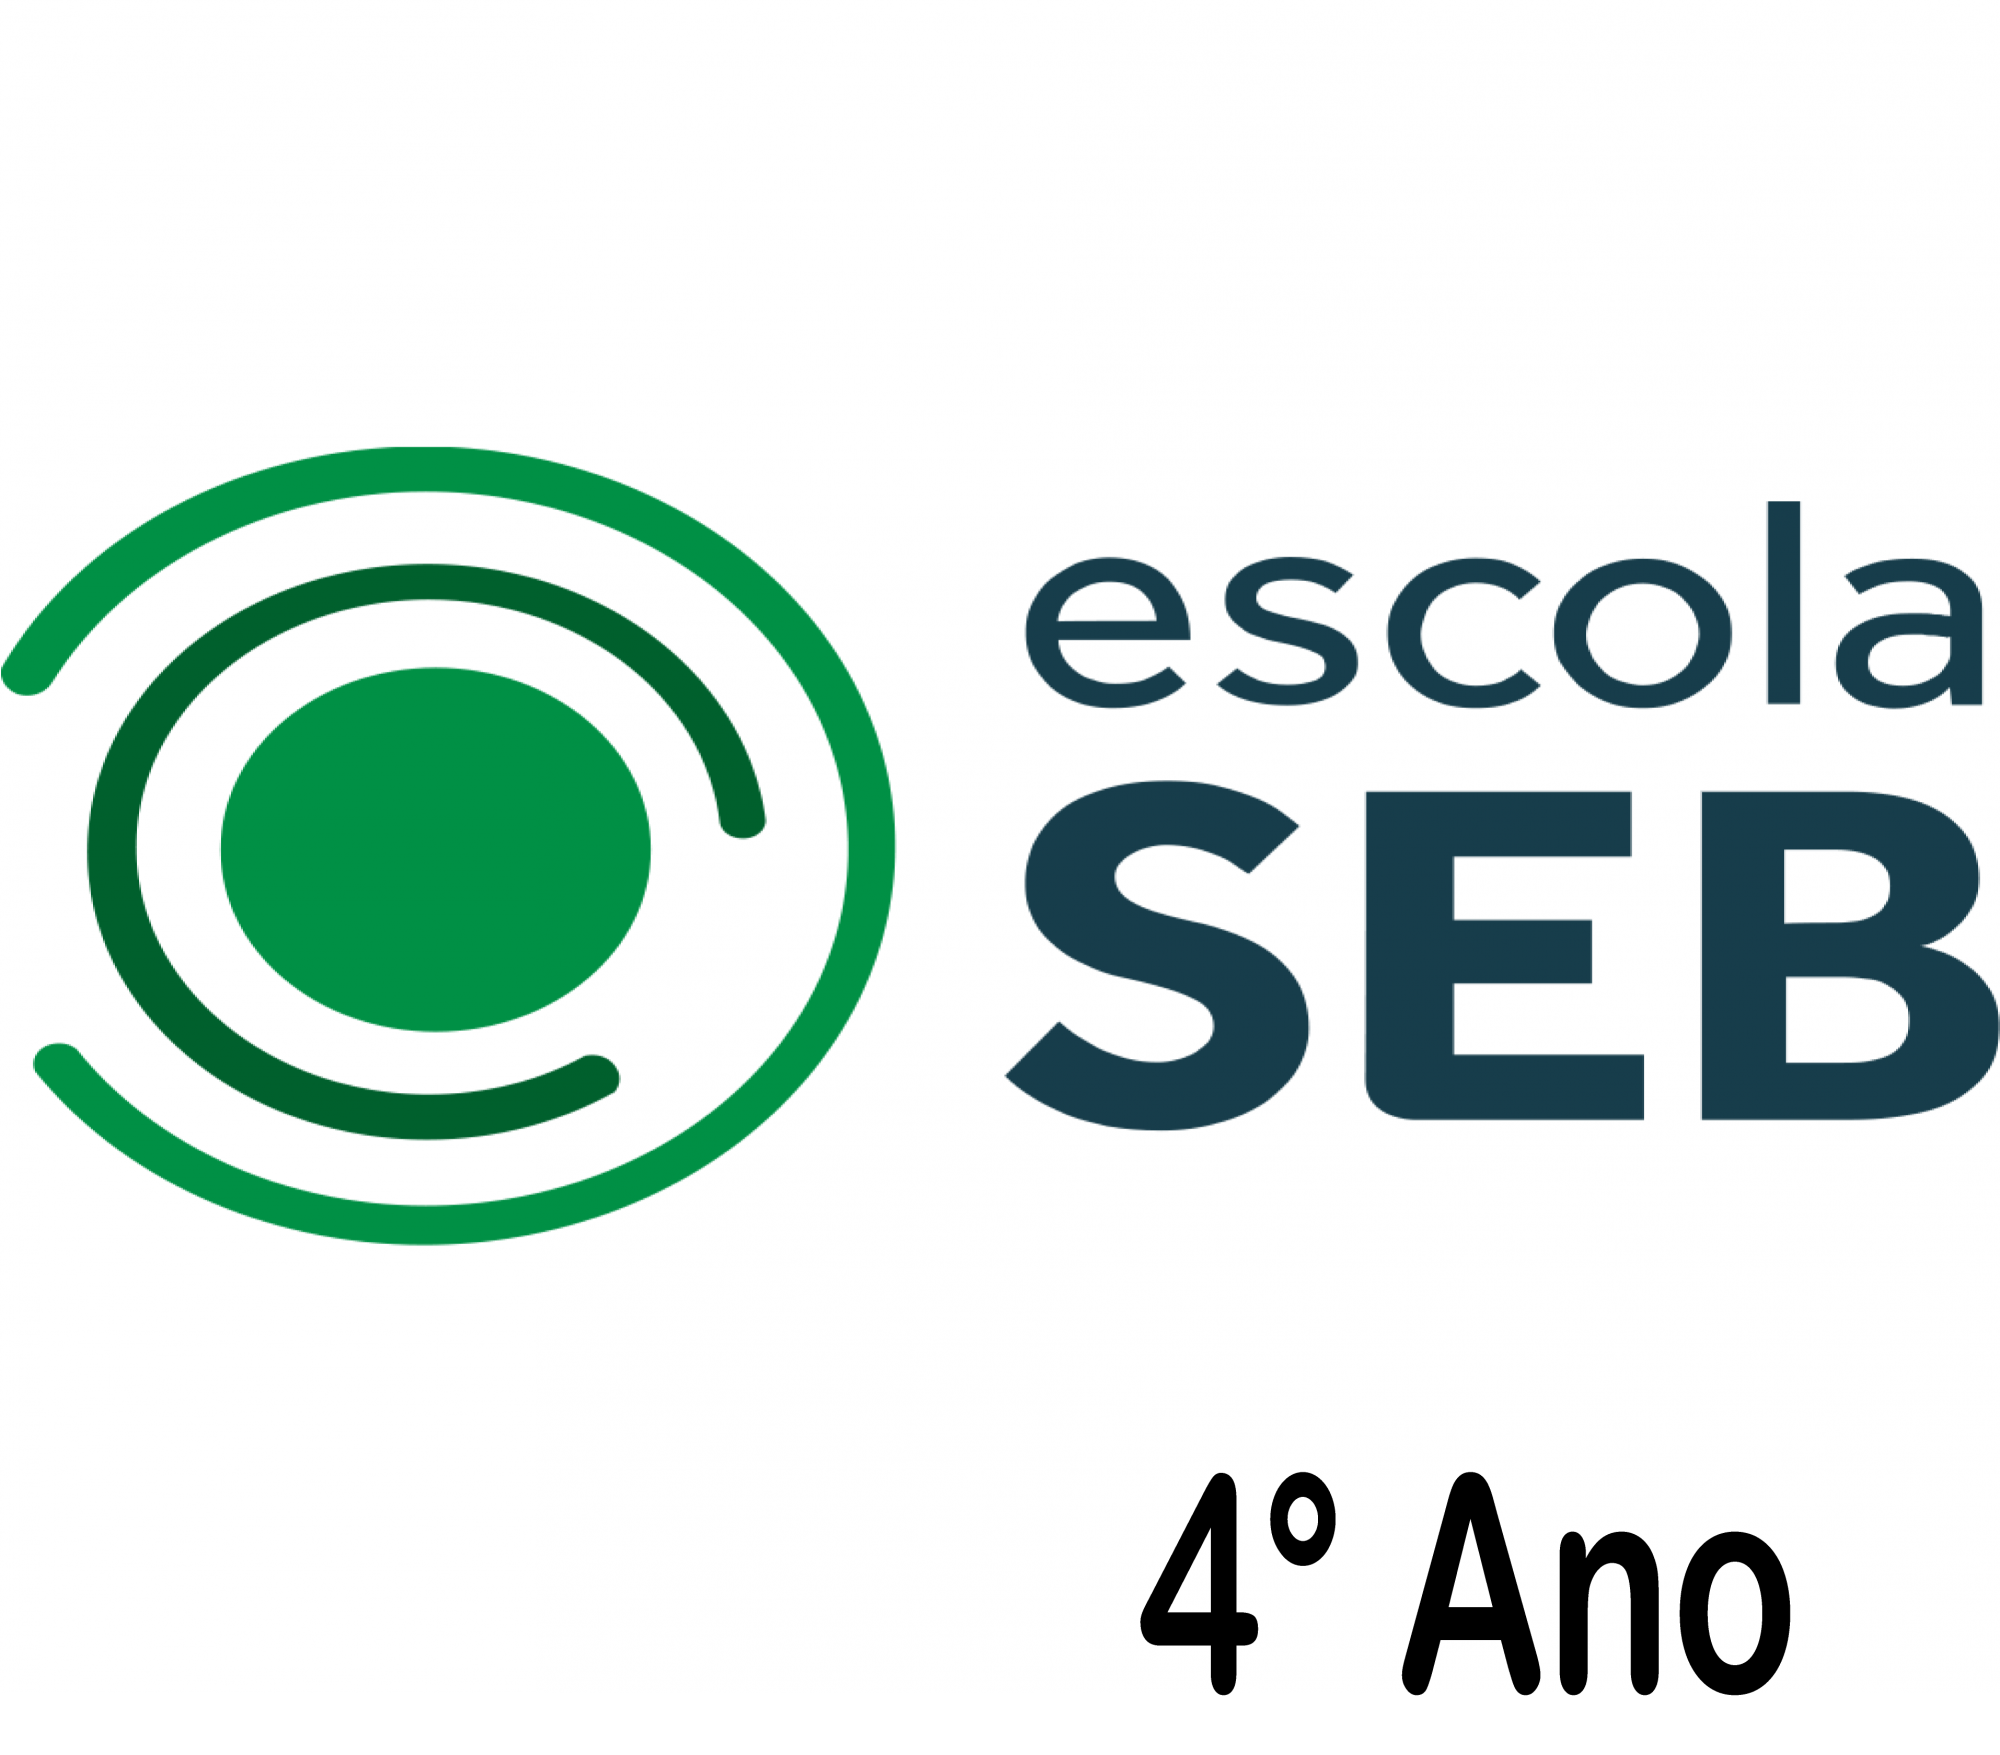 Seb Coc - 4° Ano uso pessoal Faber-Castell - 2021